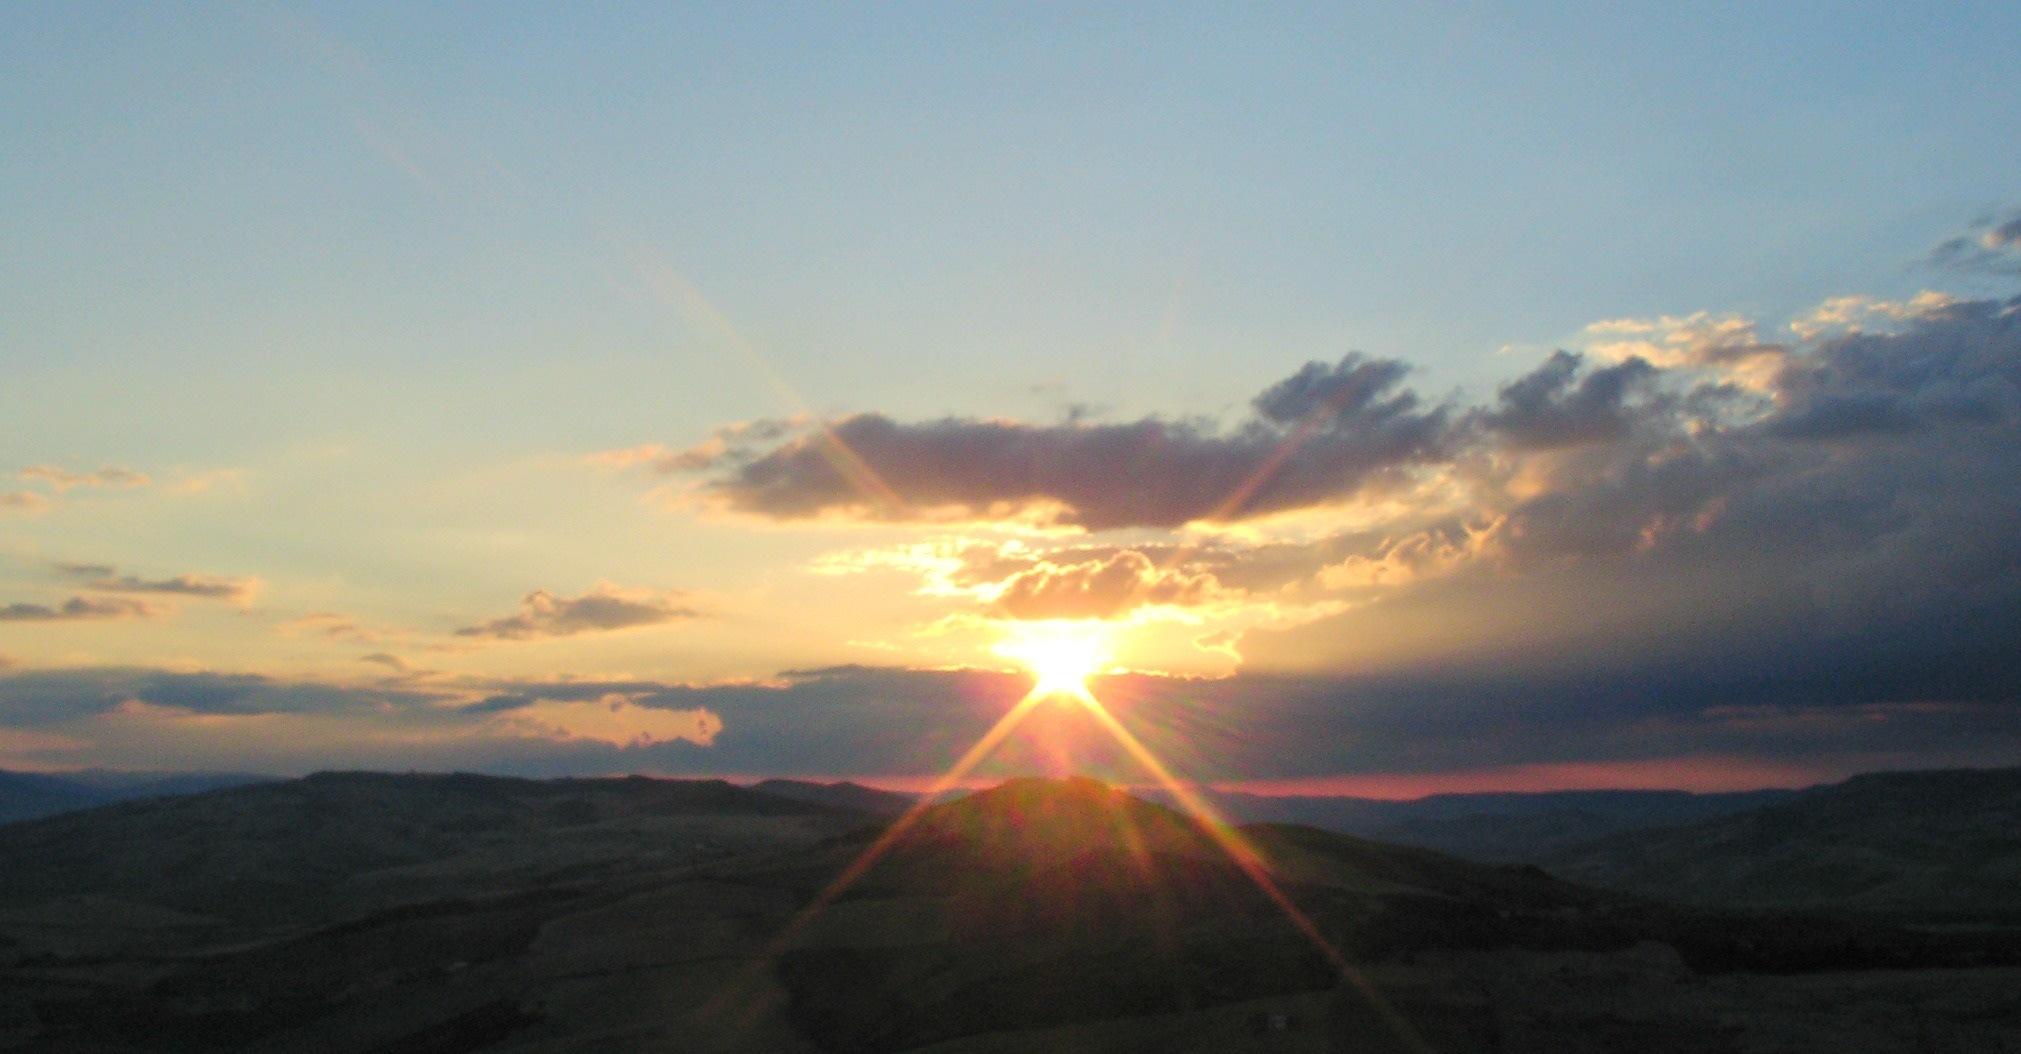 sunset by Luigi Stefanini